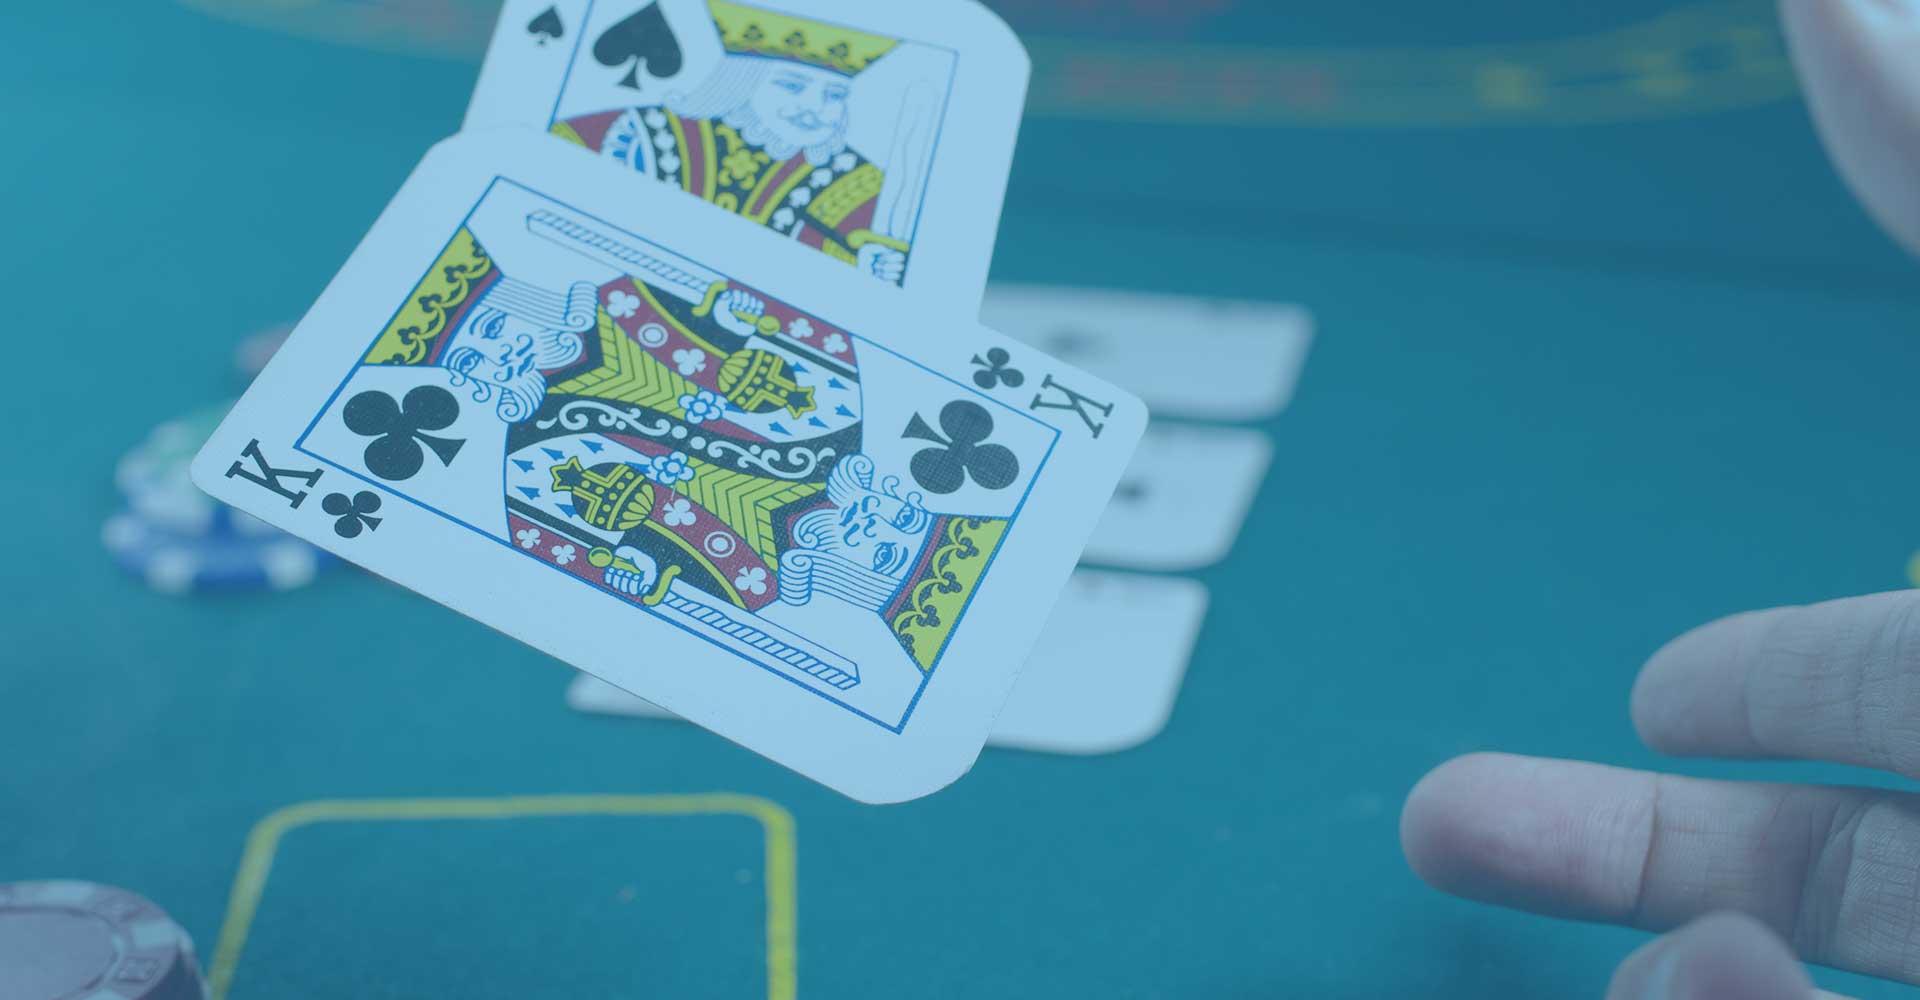 Using-Casino-Strategies-in-Video-Games